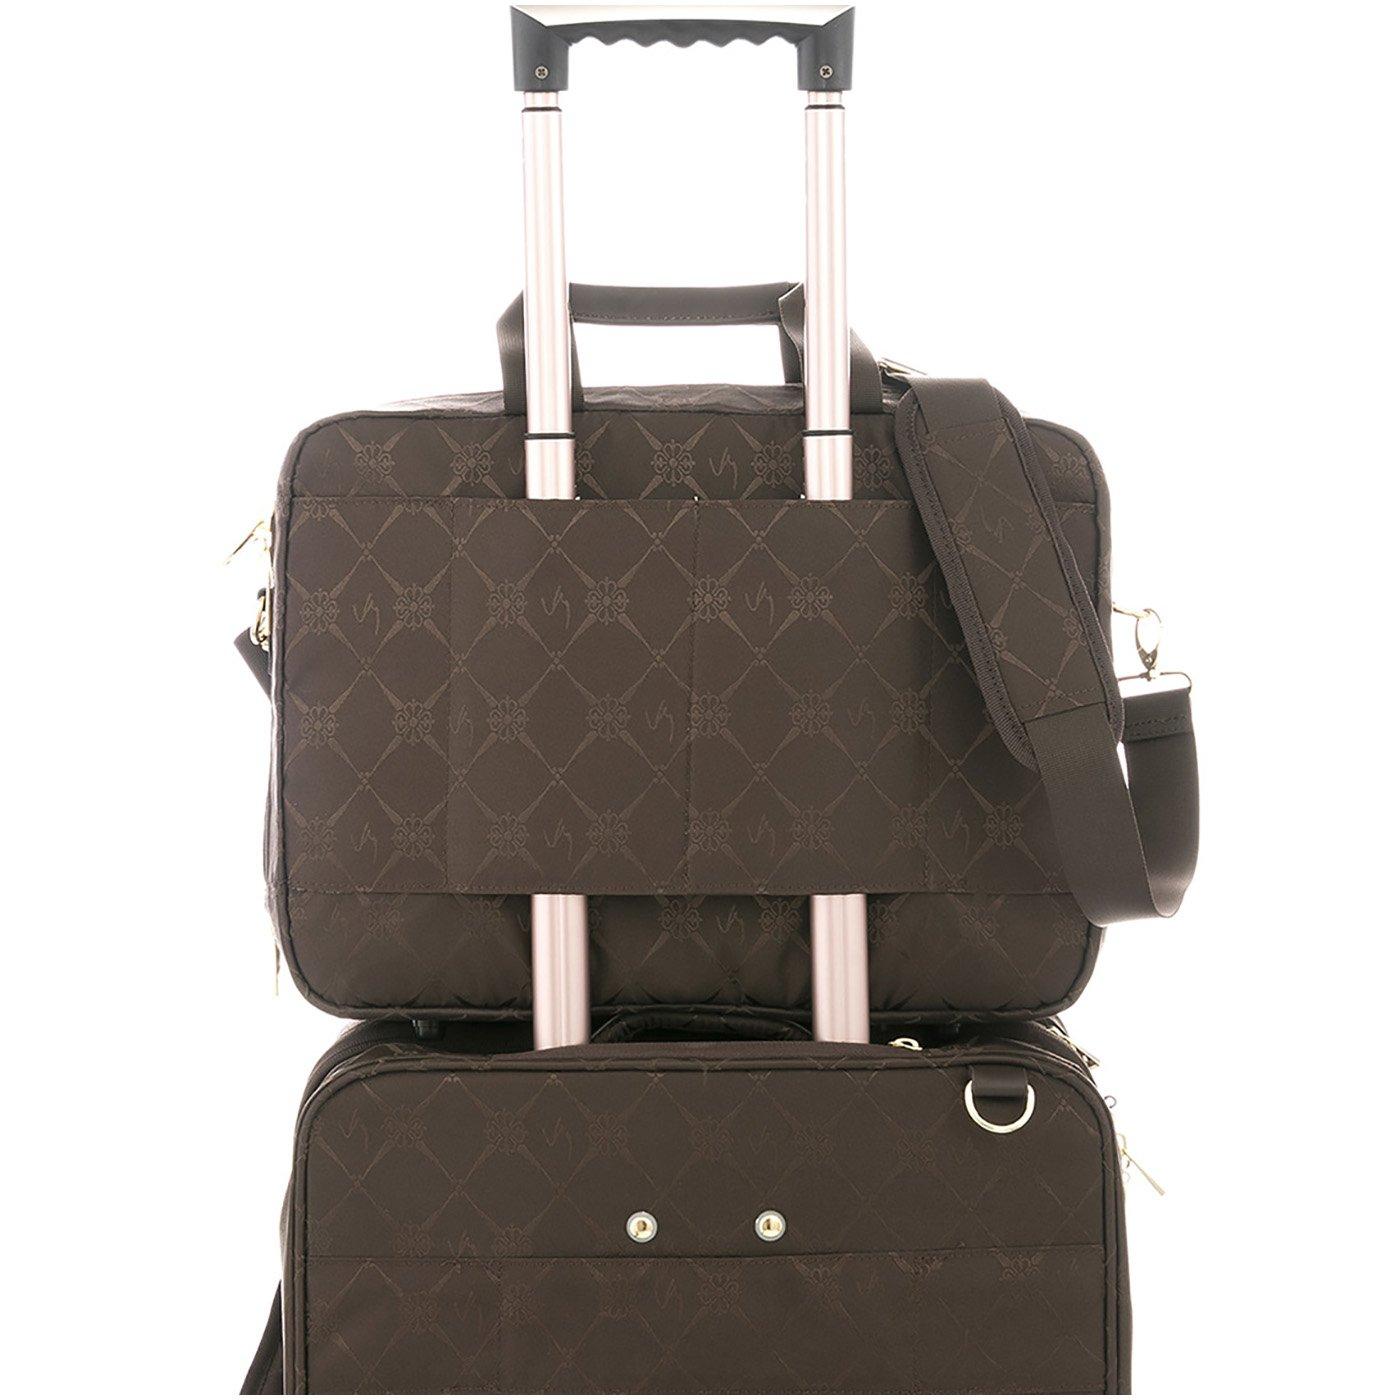 Amazon.com | VÉLEZ 19932 Women Leather Business Briefcase | Maletín De Cuero Mujer Coffee | Briefcases